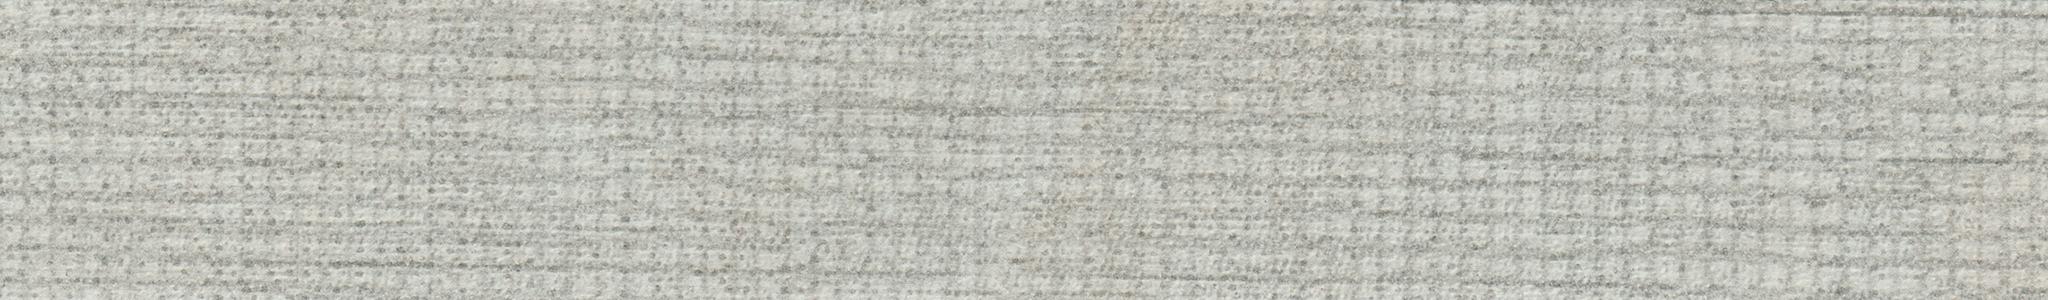 HD 293915 ABS hrana linus perla